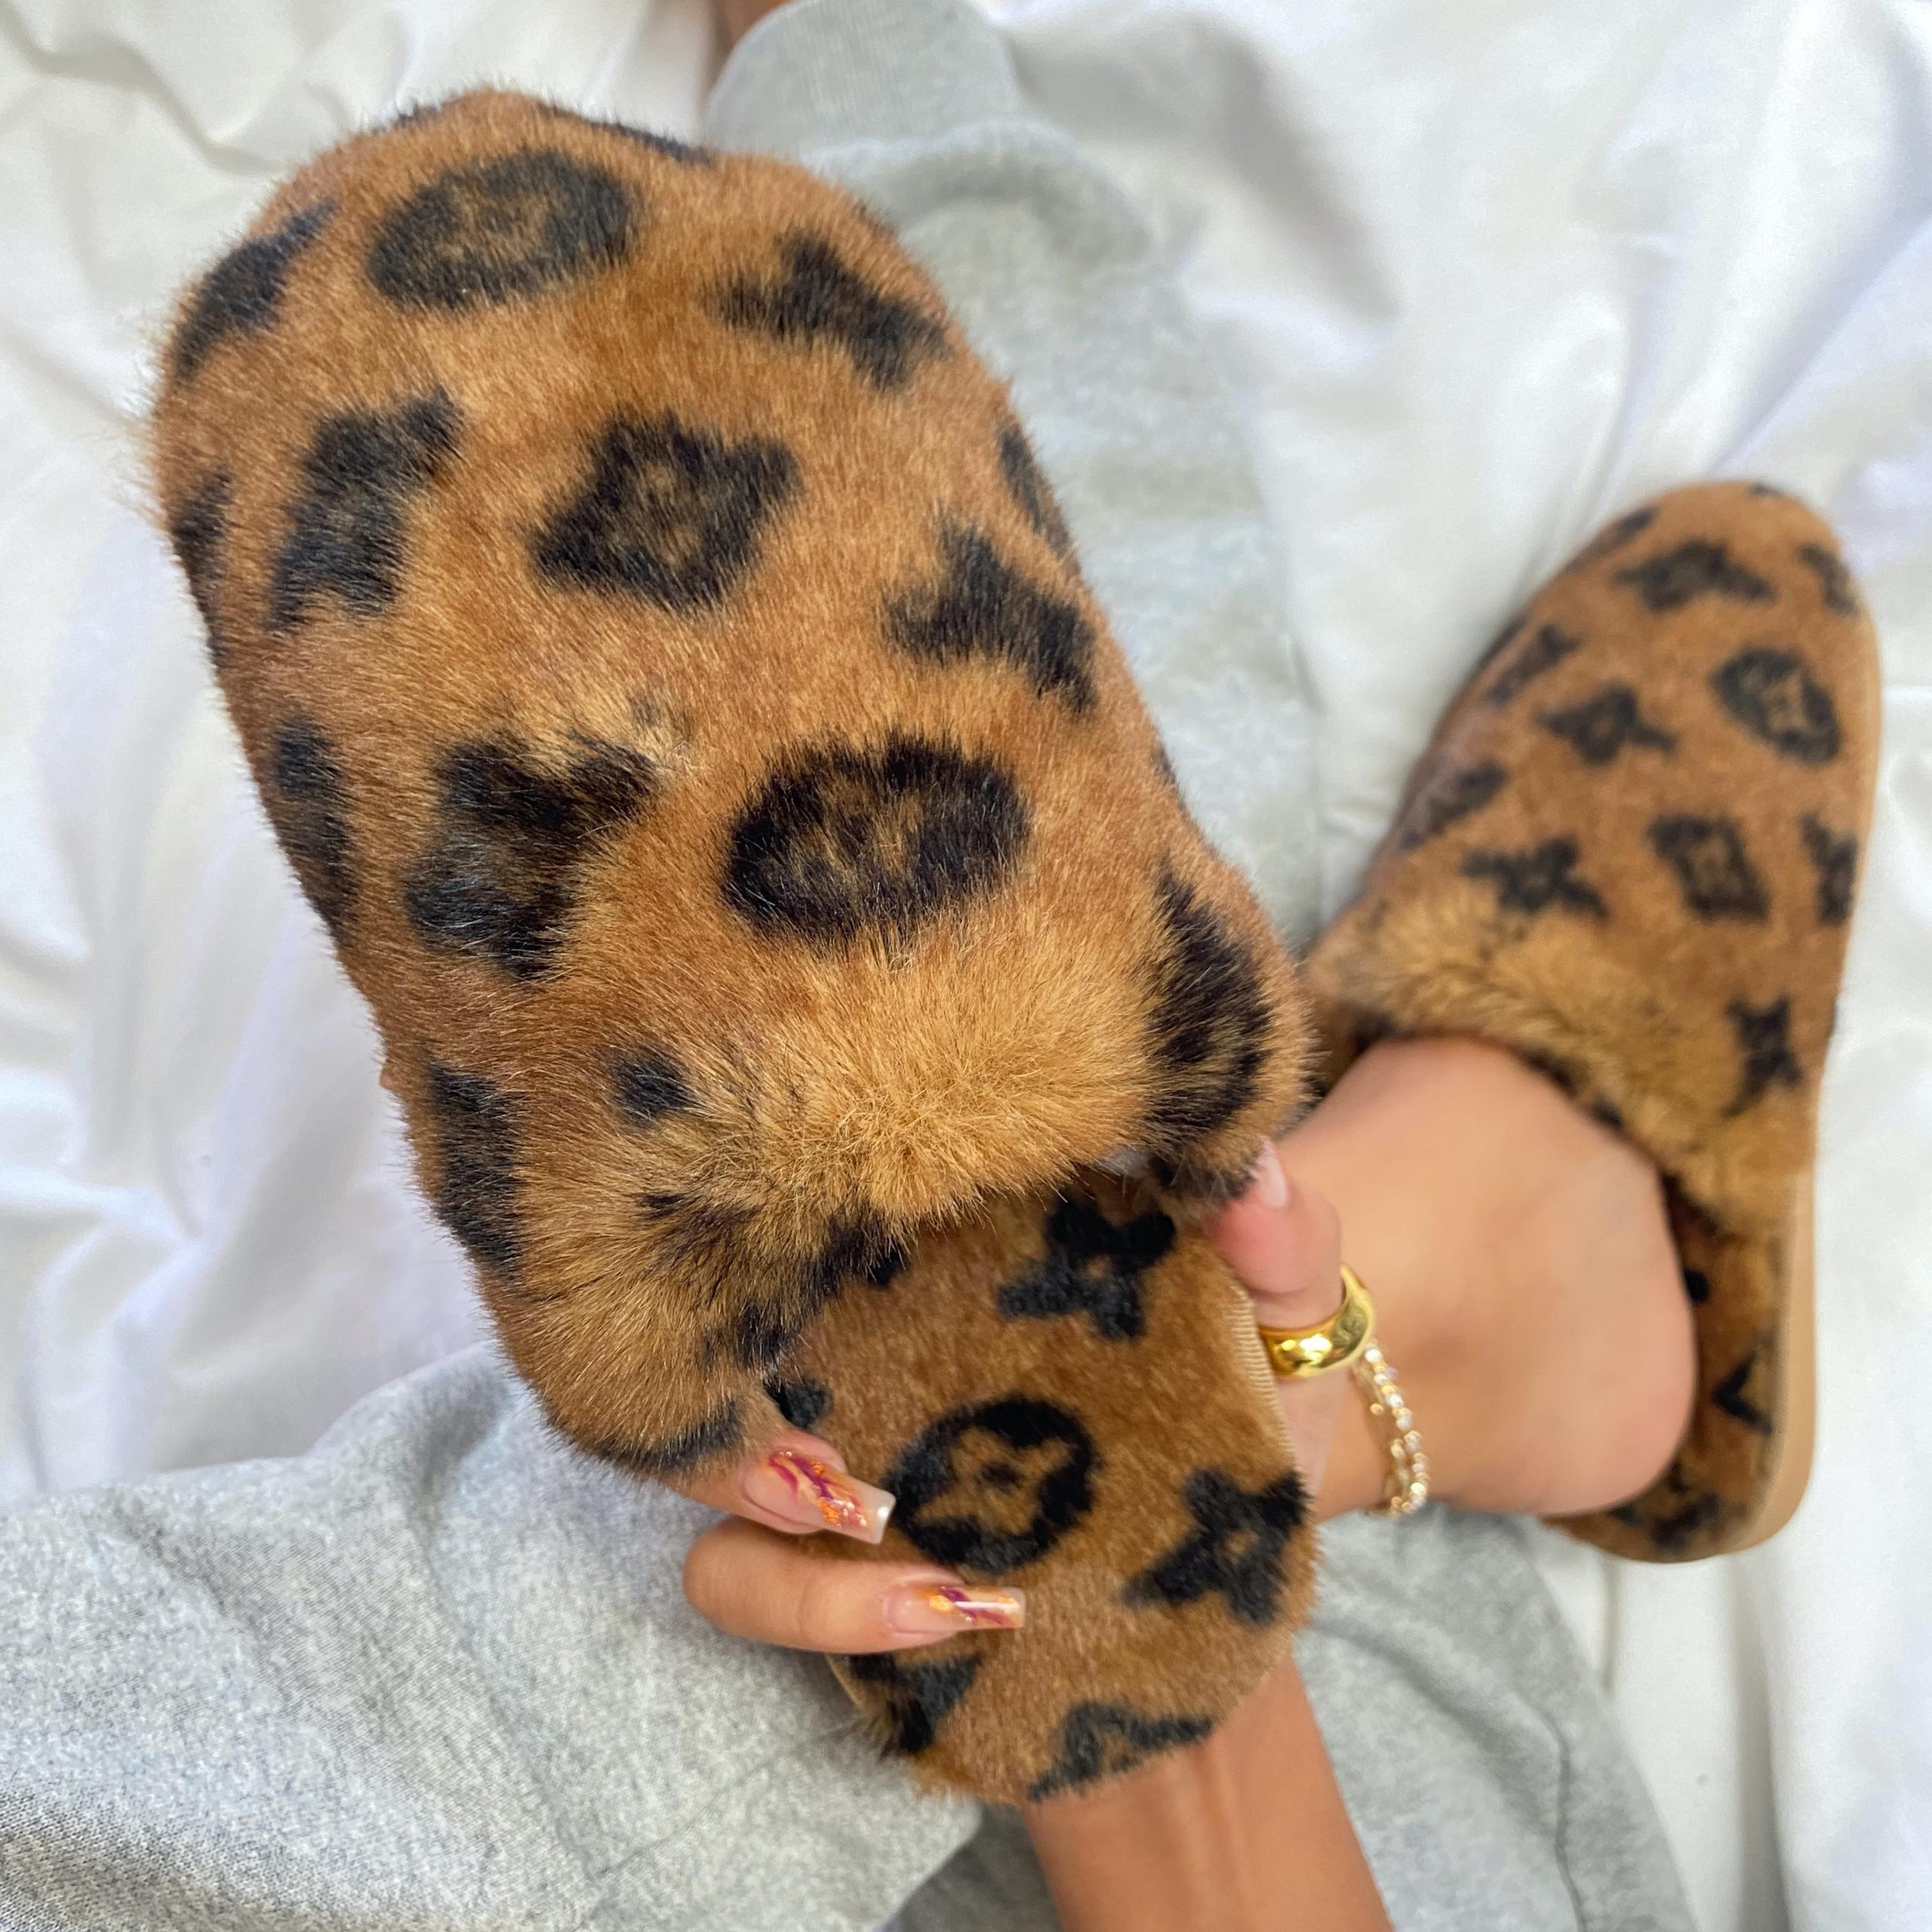 EGO Kulture Fluffy Printed Detail Flat Slipper In Tan Brown Faux Fur, Brown  - female - Size: 9